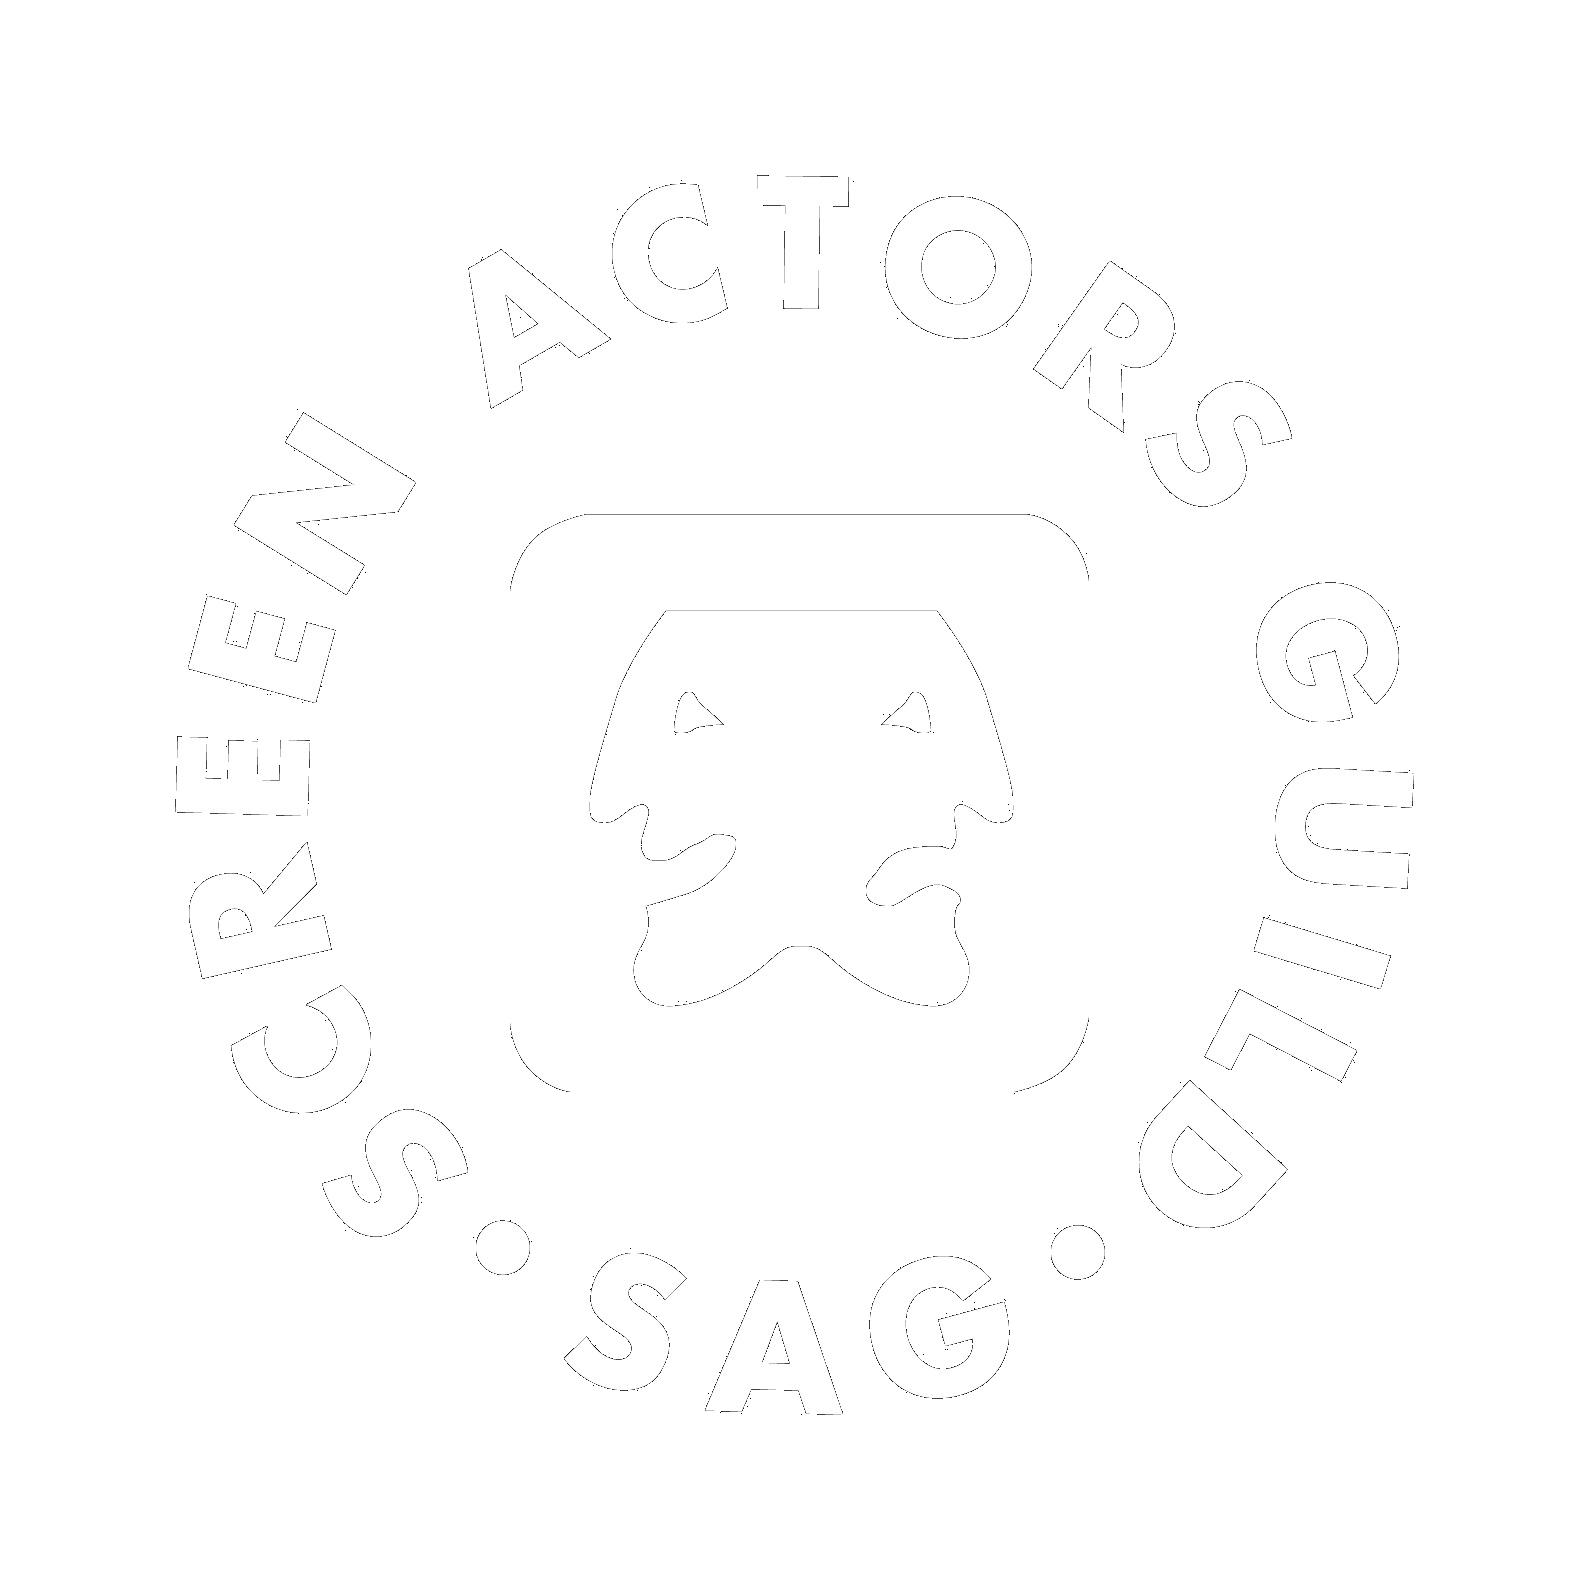 SAG, AFTRA Members Approve Merger to Form SAG-AFTRA | SAG-AFTRA